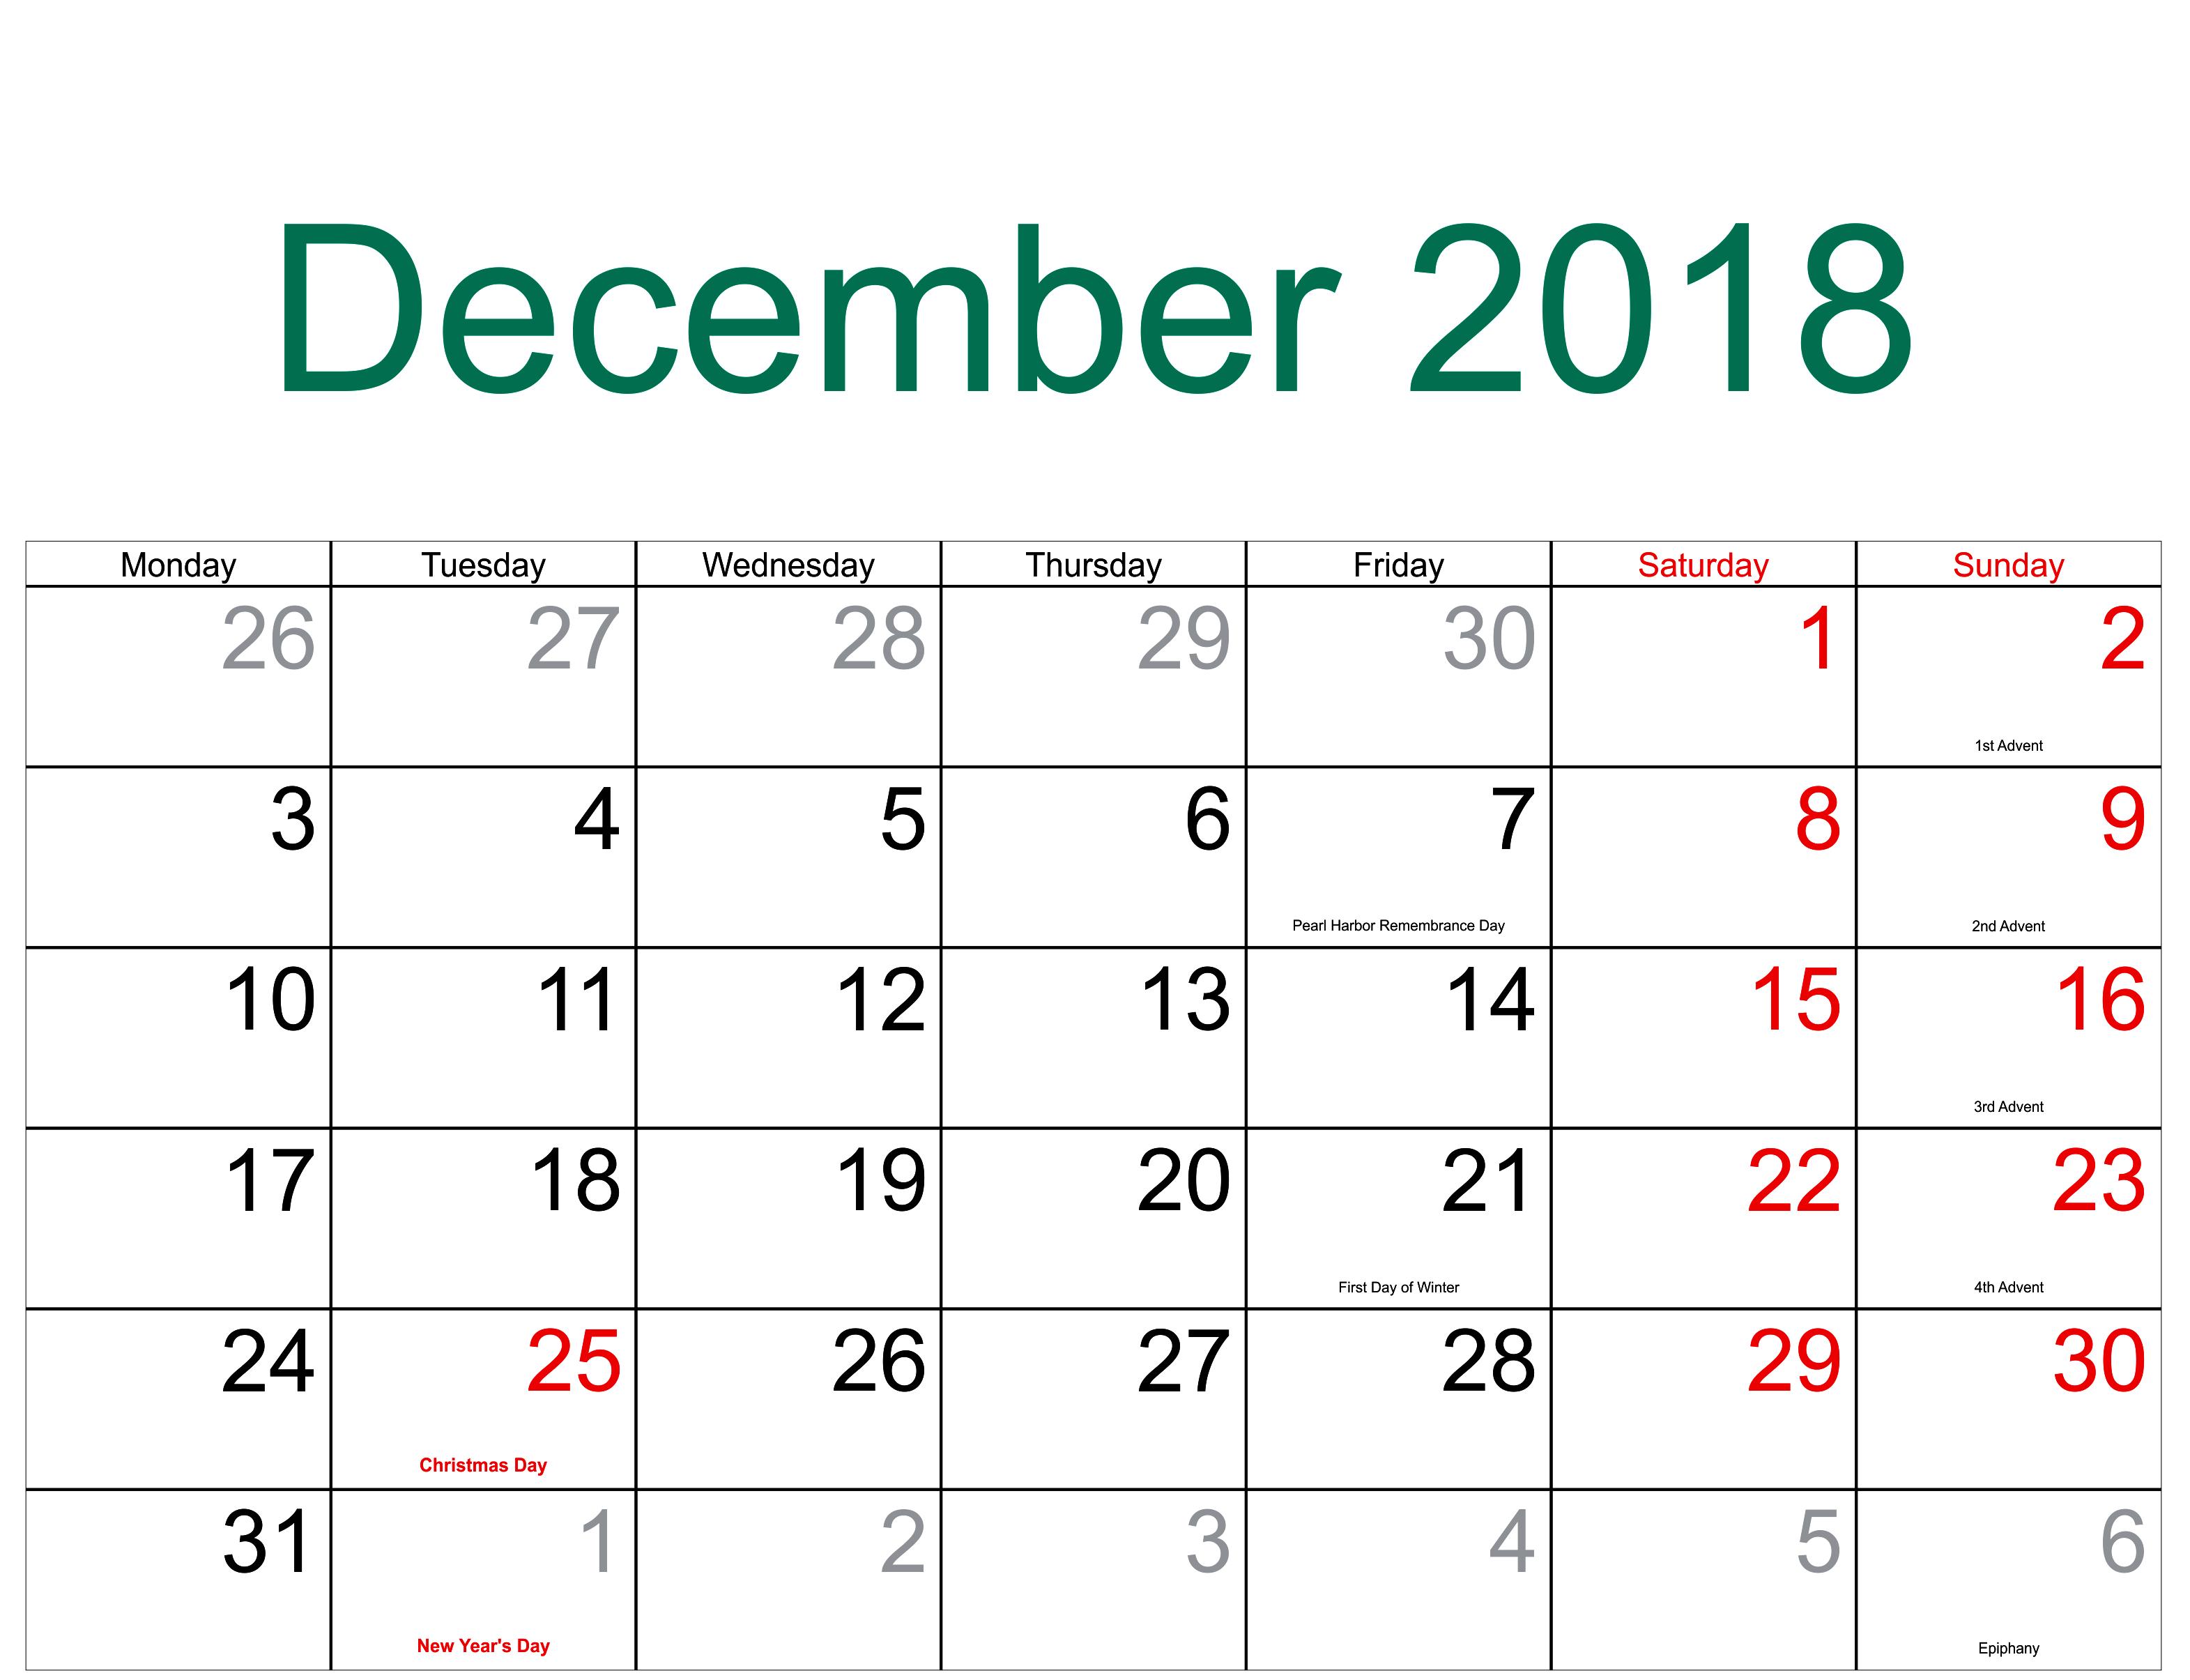 December Calendar 2018 With Holidays | December 2018 Calendar | July for Holidays Calendar Templates November